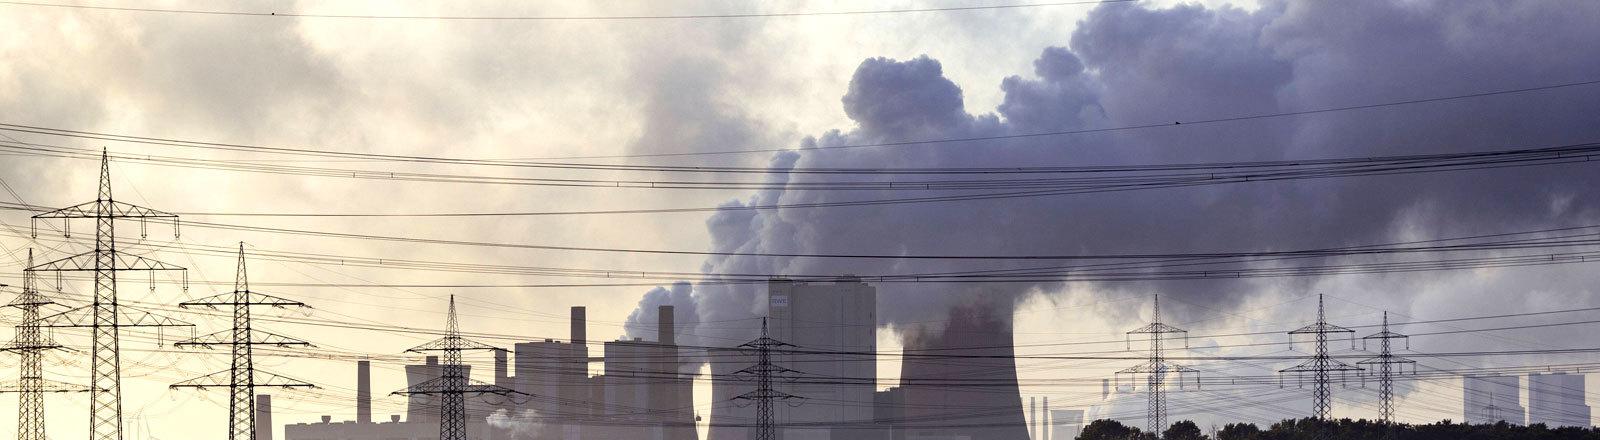 Ein Kohlekraftwerk.